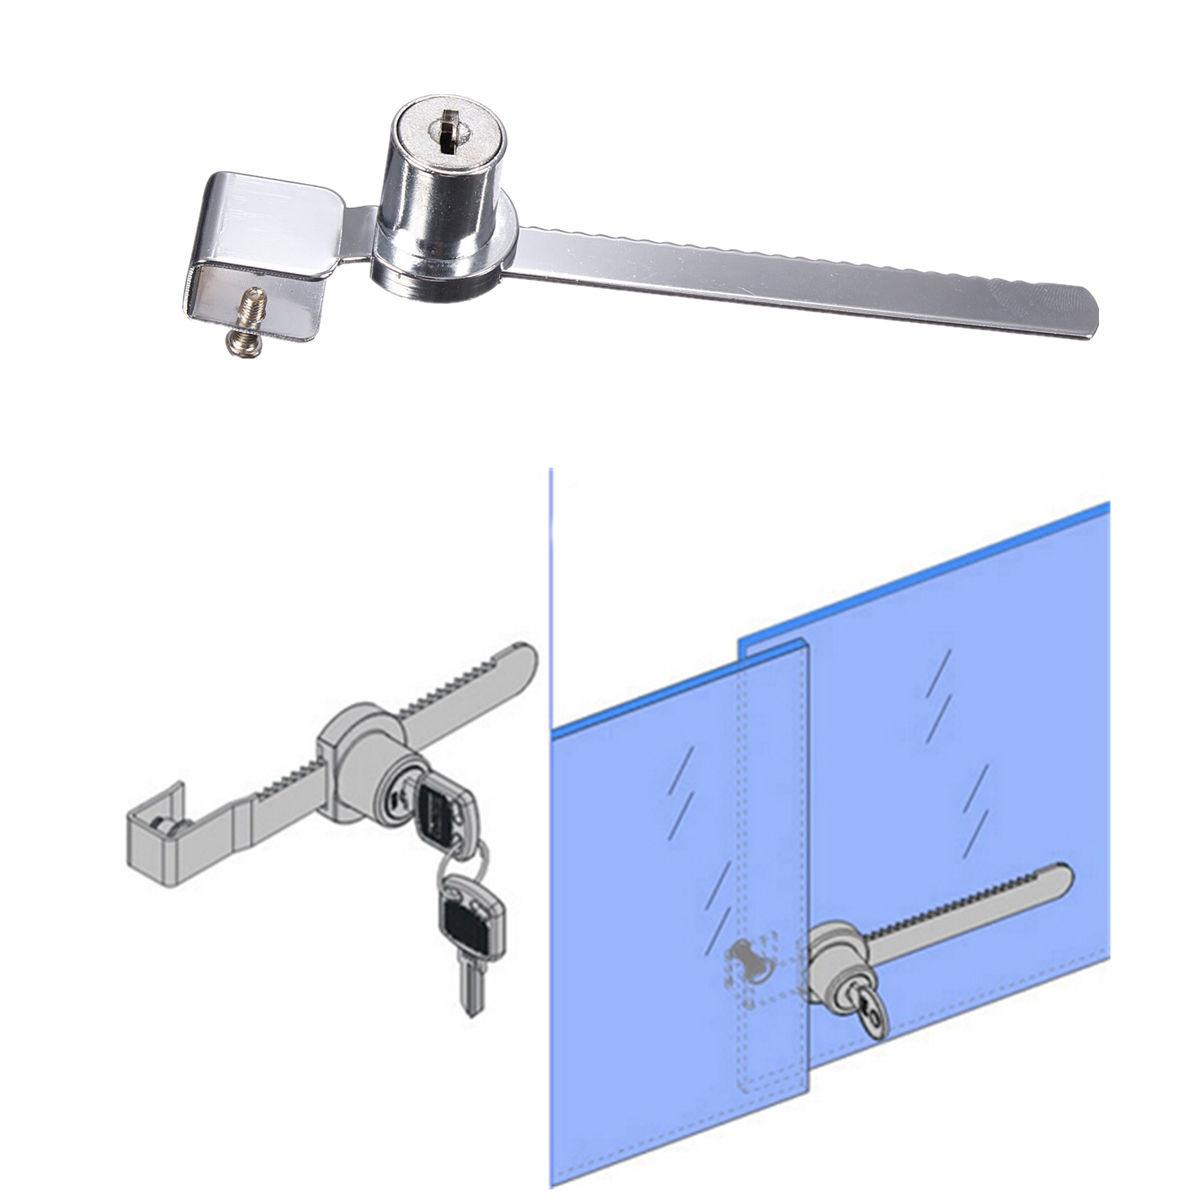 2 Keys Keyed Alike Display Case Showcase Lock Sliding